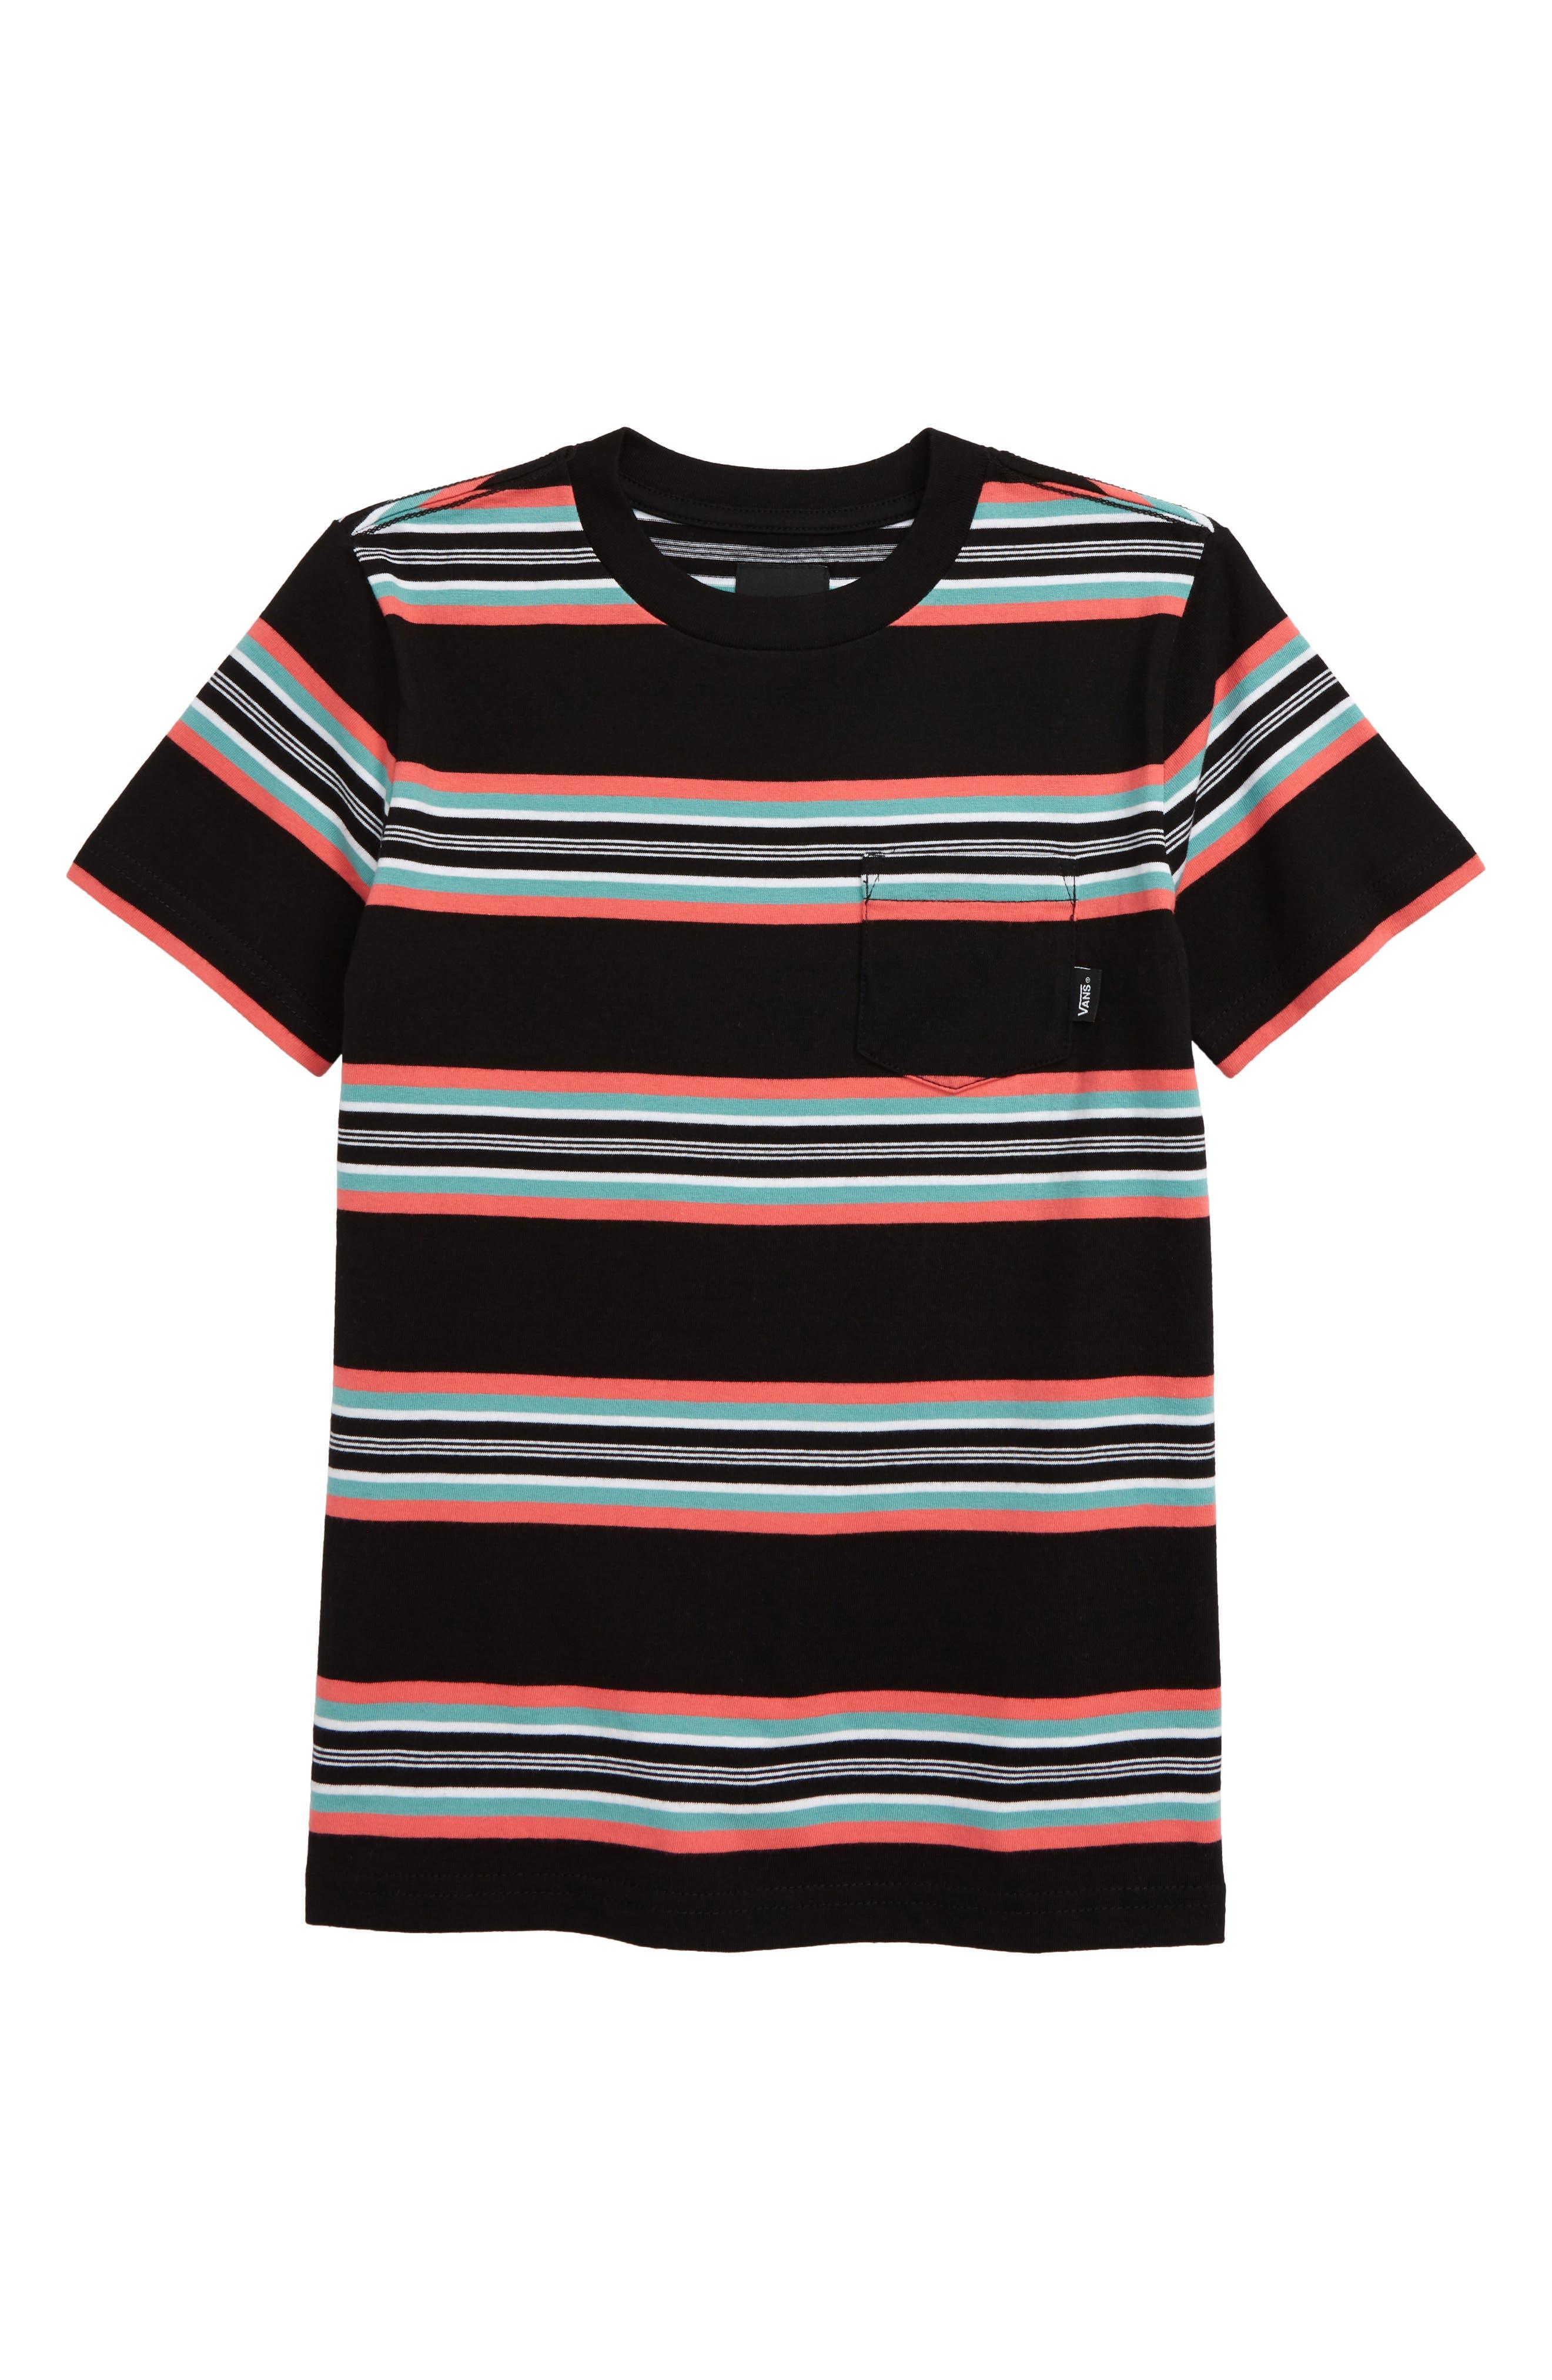 vans bebe tee shirt